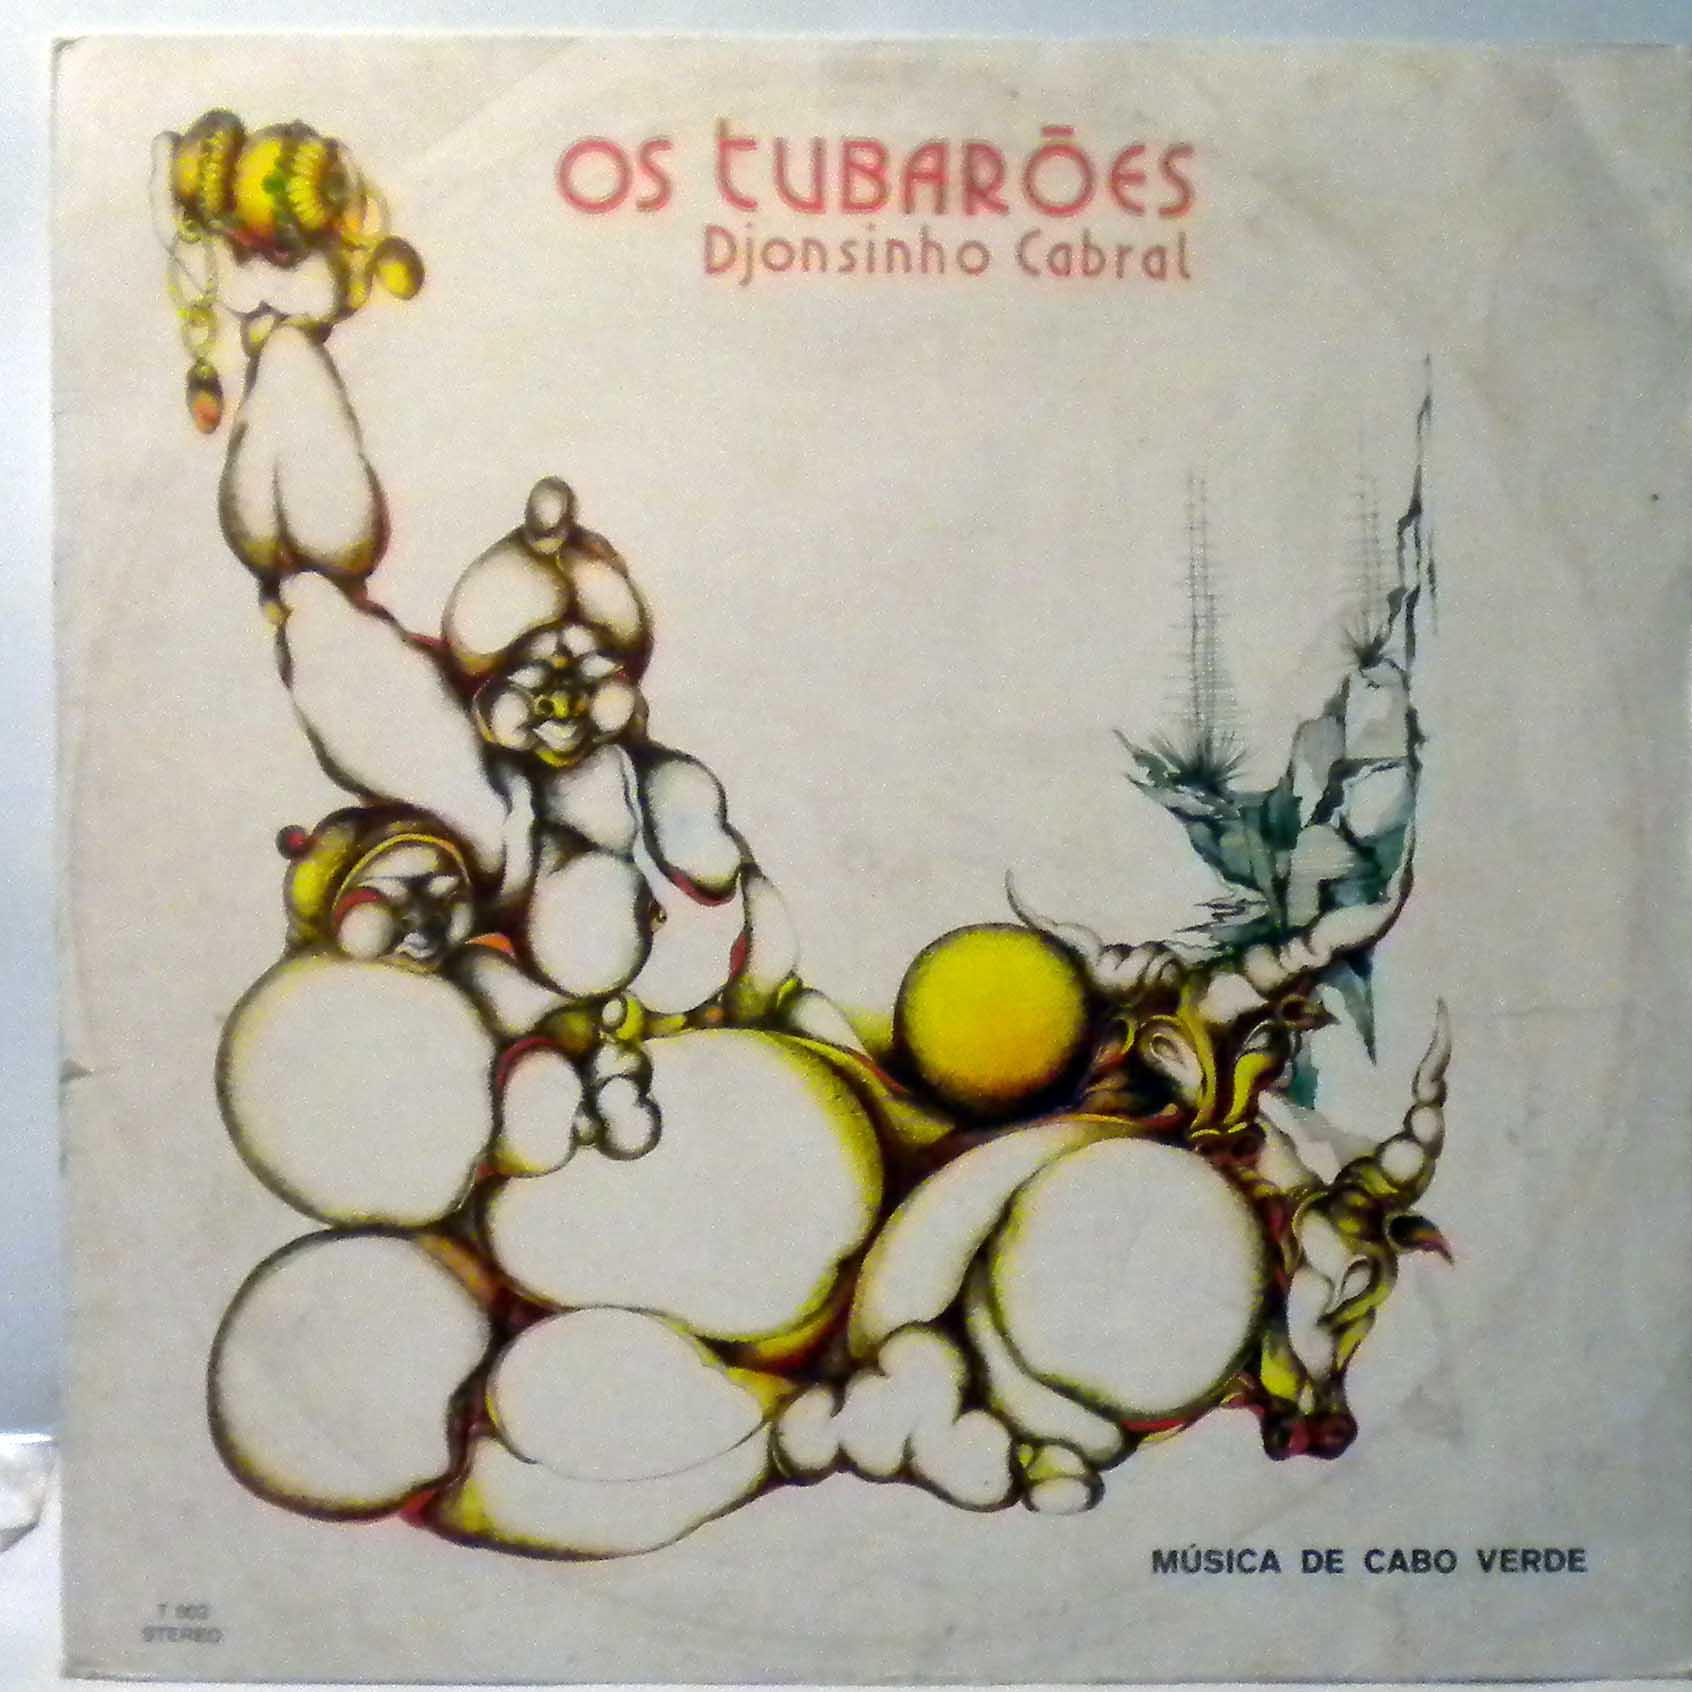 OS TUBAROES - Djonsinho Cabral - LP